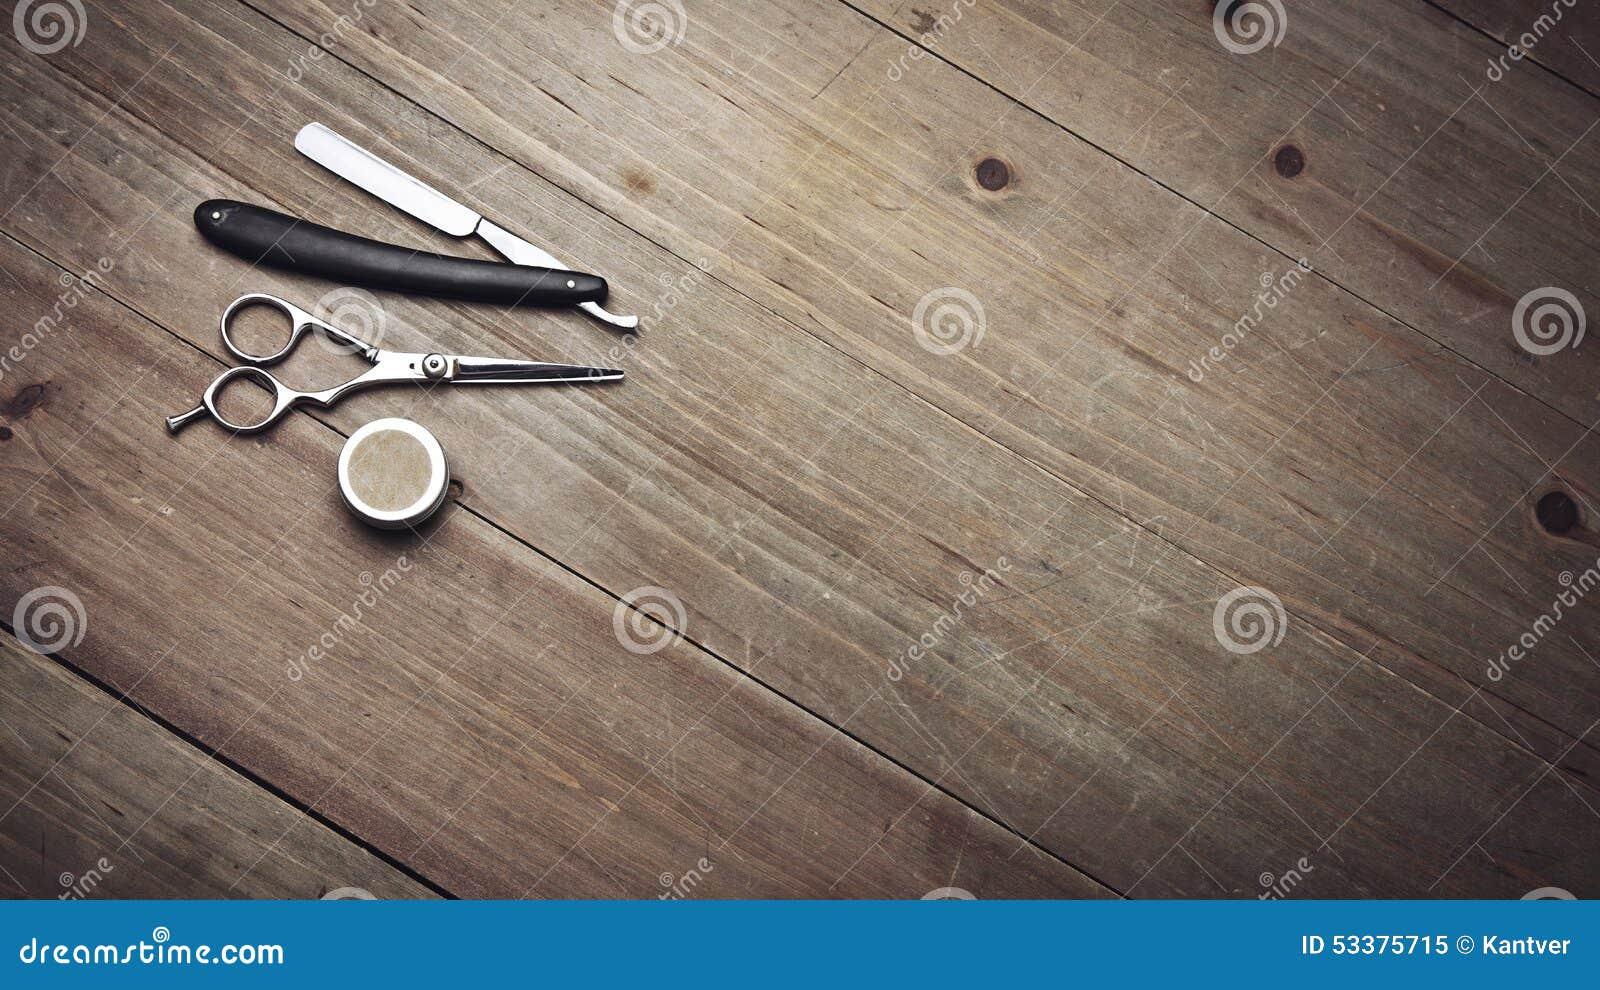 Vintage Barber Tools On Wood Table Stock Photo Image